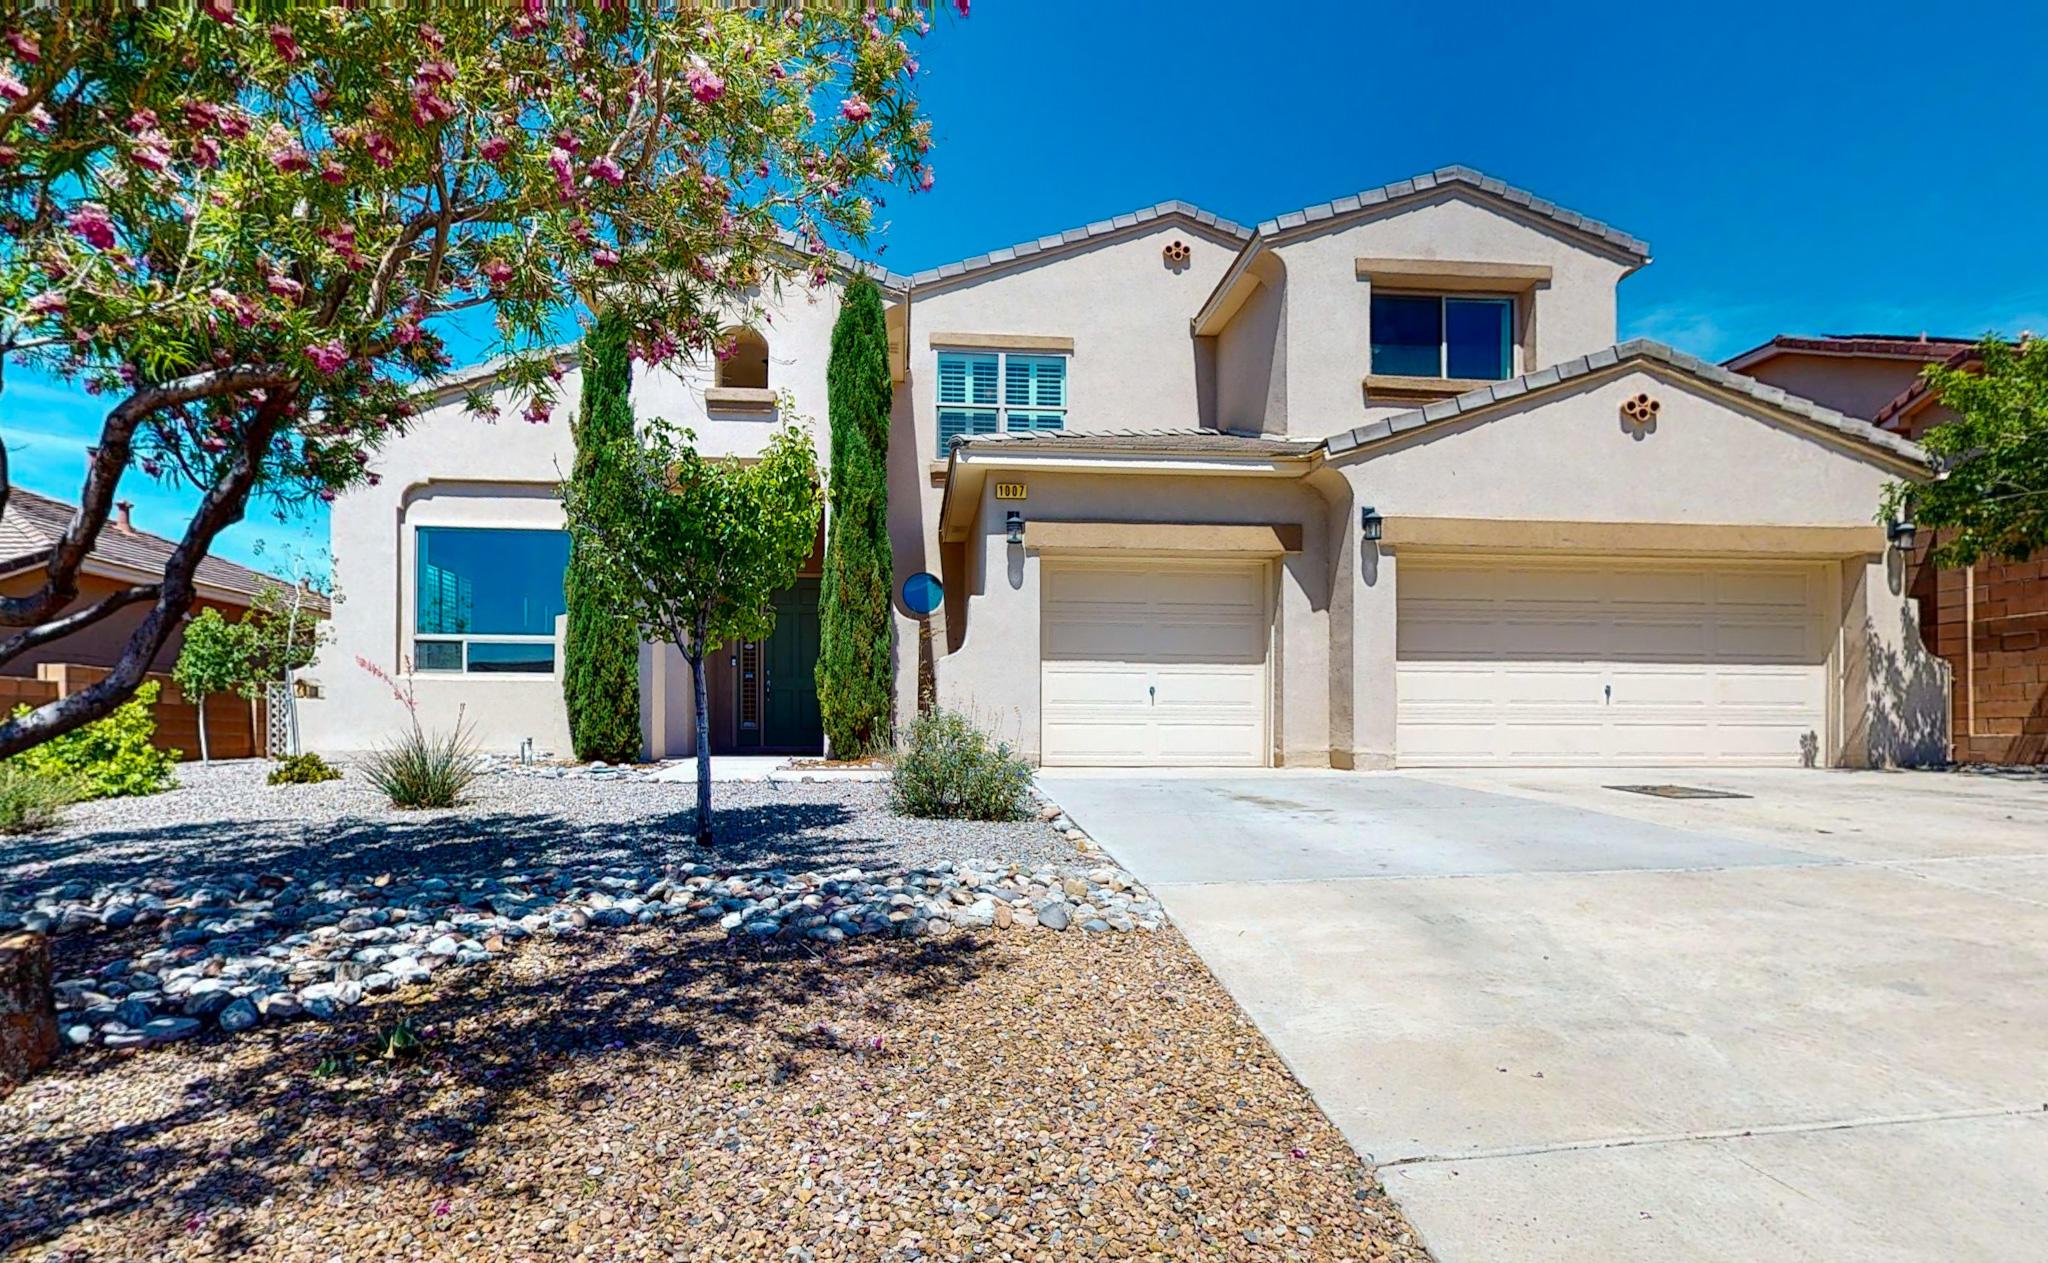 1007 DESERT BROOM Road, Rio Rancho NM 87144